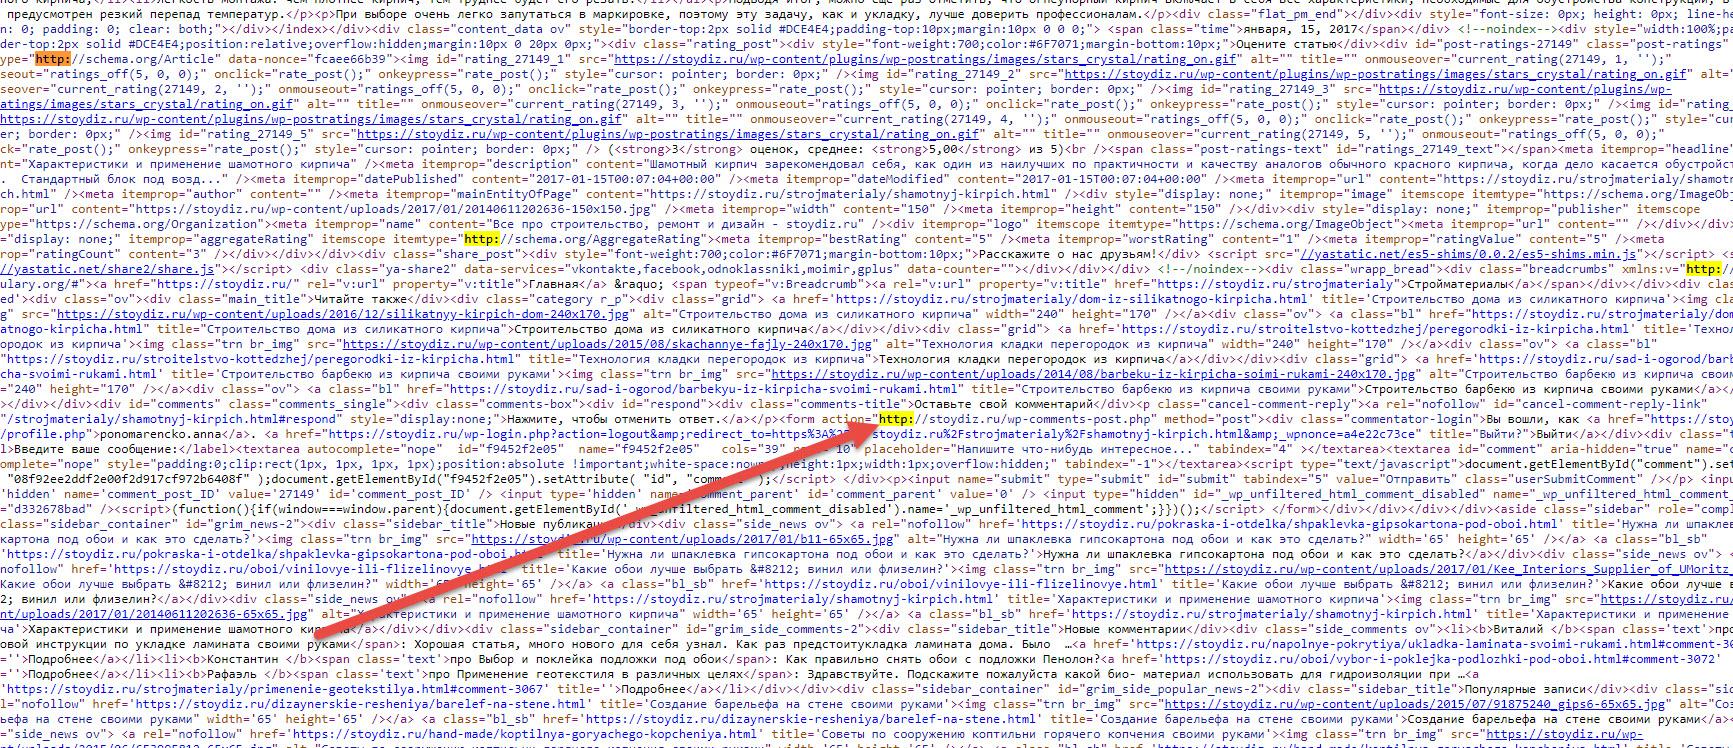 Миксконтент в исходном коде